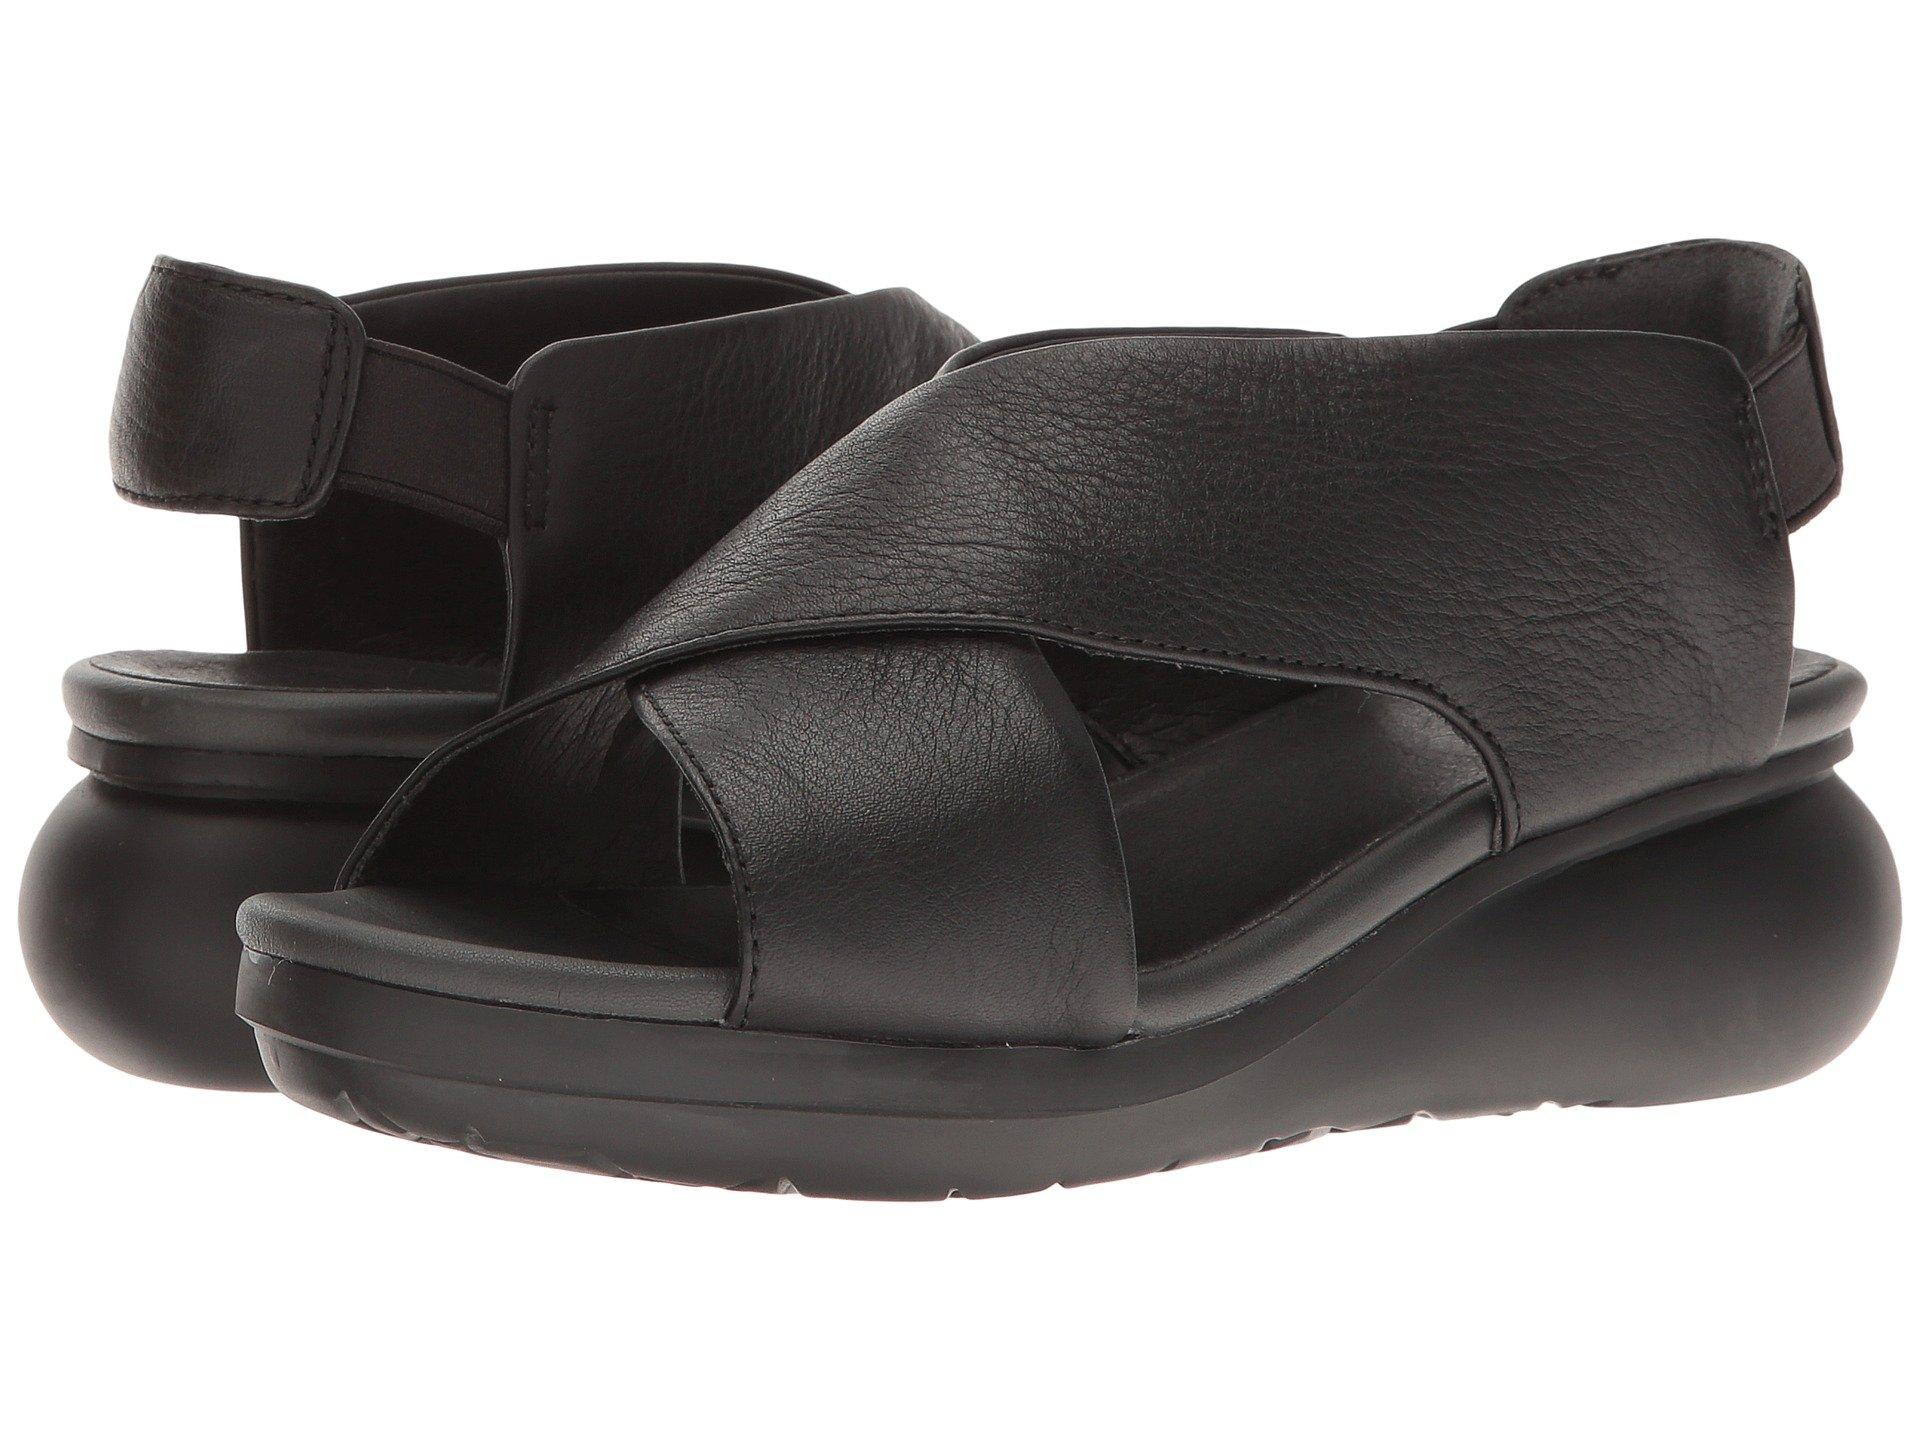 e407823d12 Women's Camper Shoes + FREE SHIPPING | Zappos.com